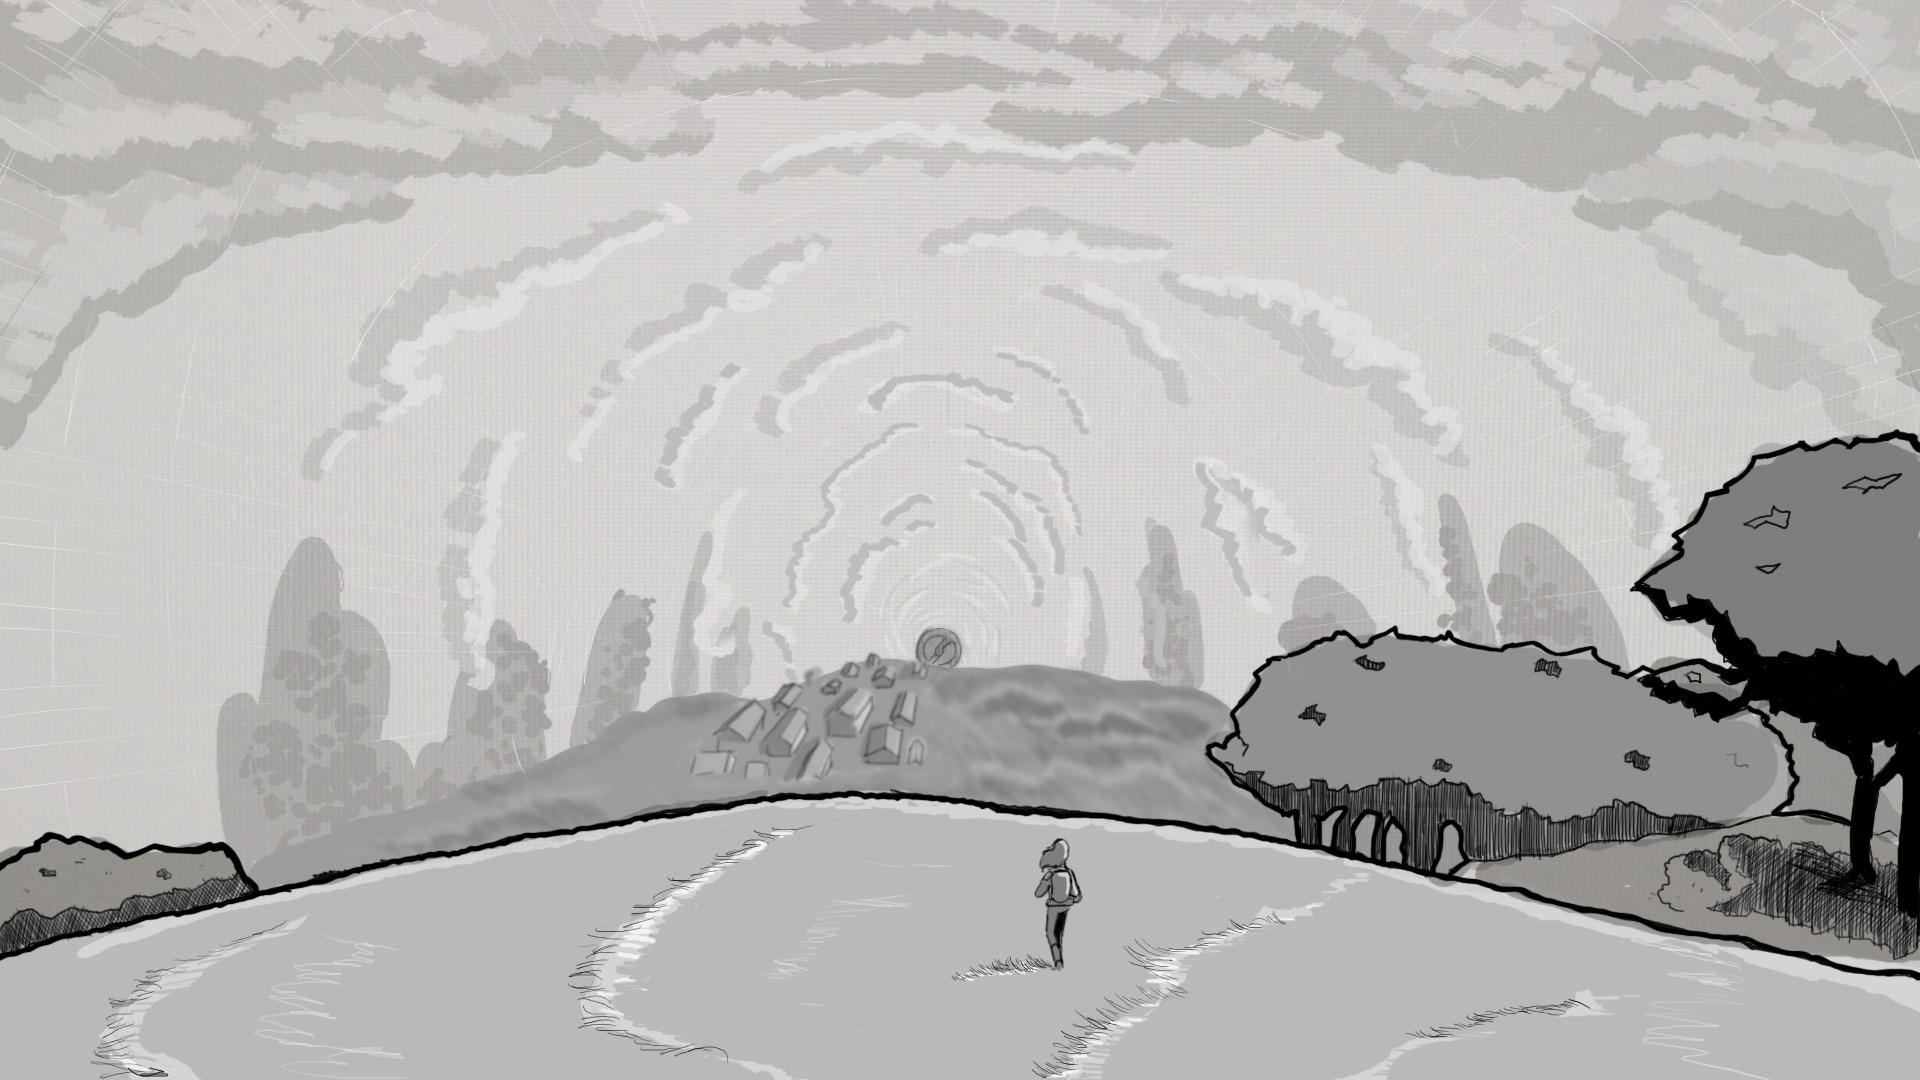 Wanderyear